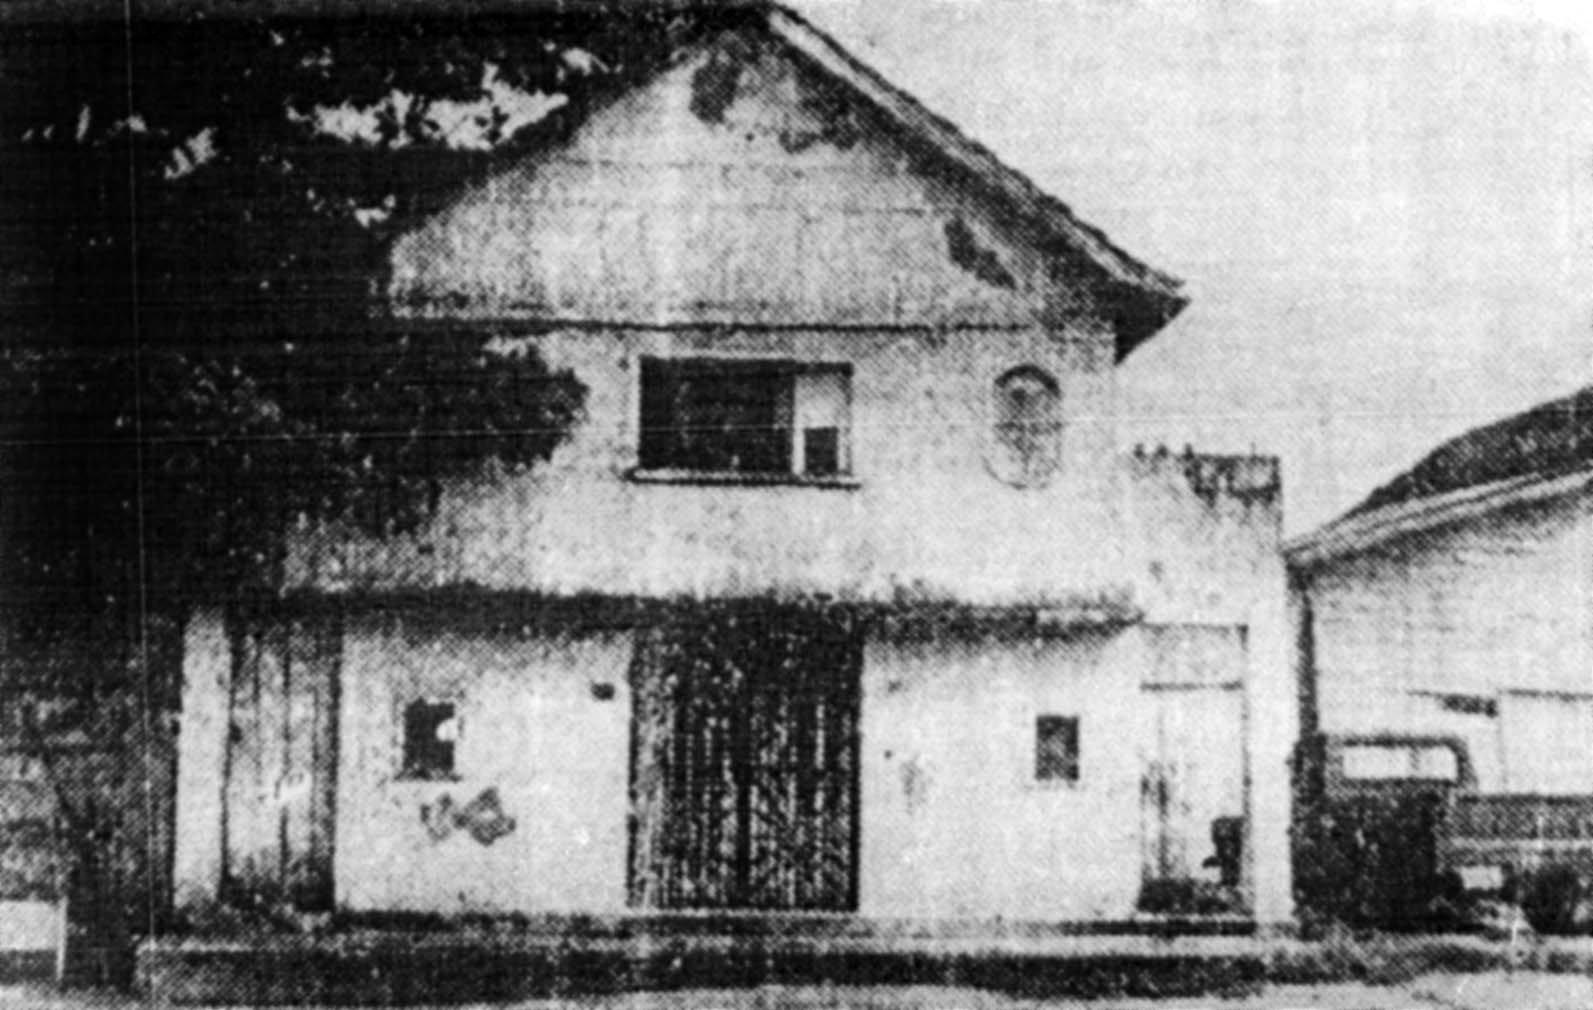 Cine Constantinópolis depois Cine Rex